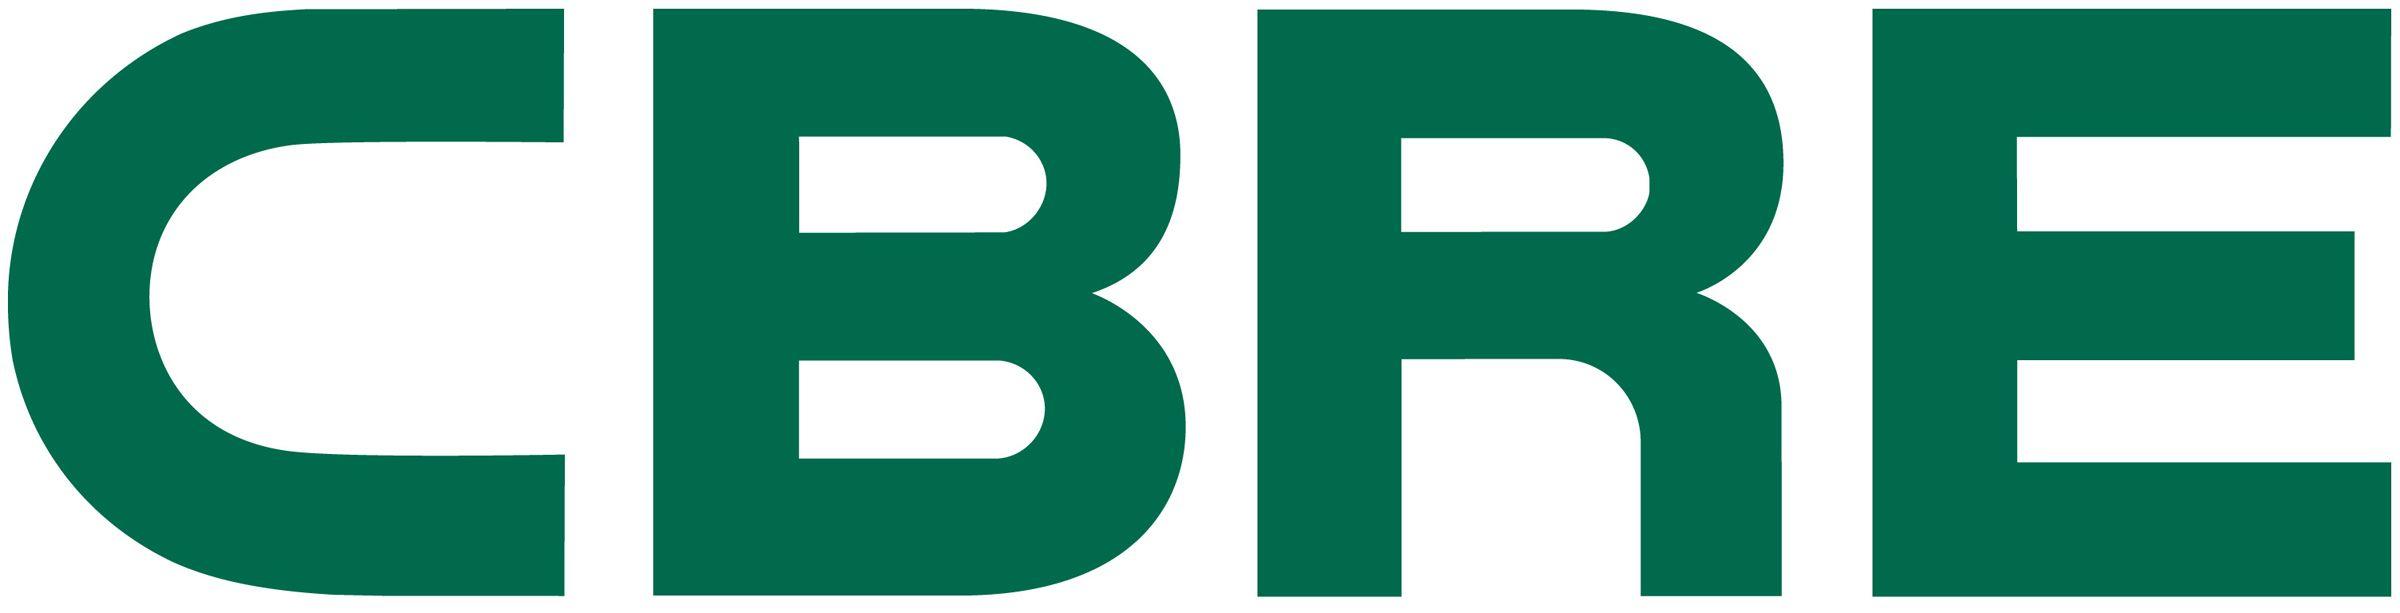 CBRE National Retail Partners – West (NRP-West) Logo